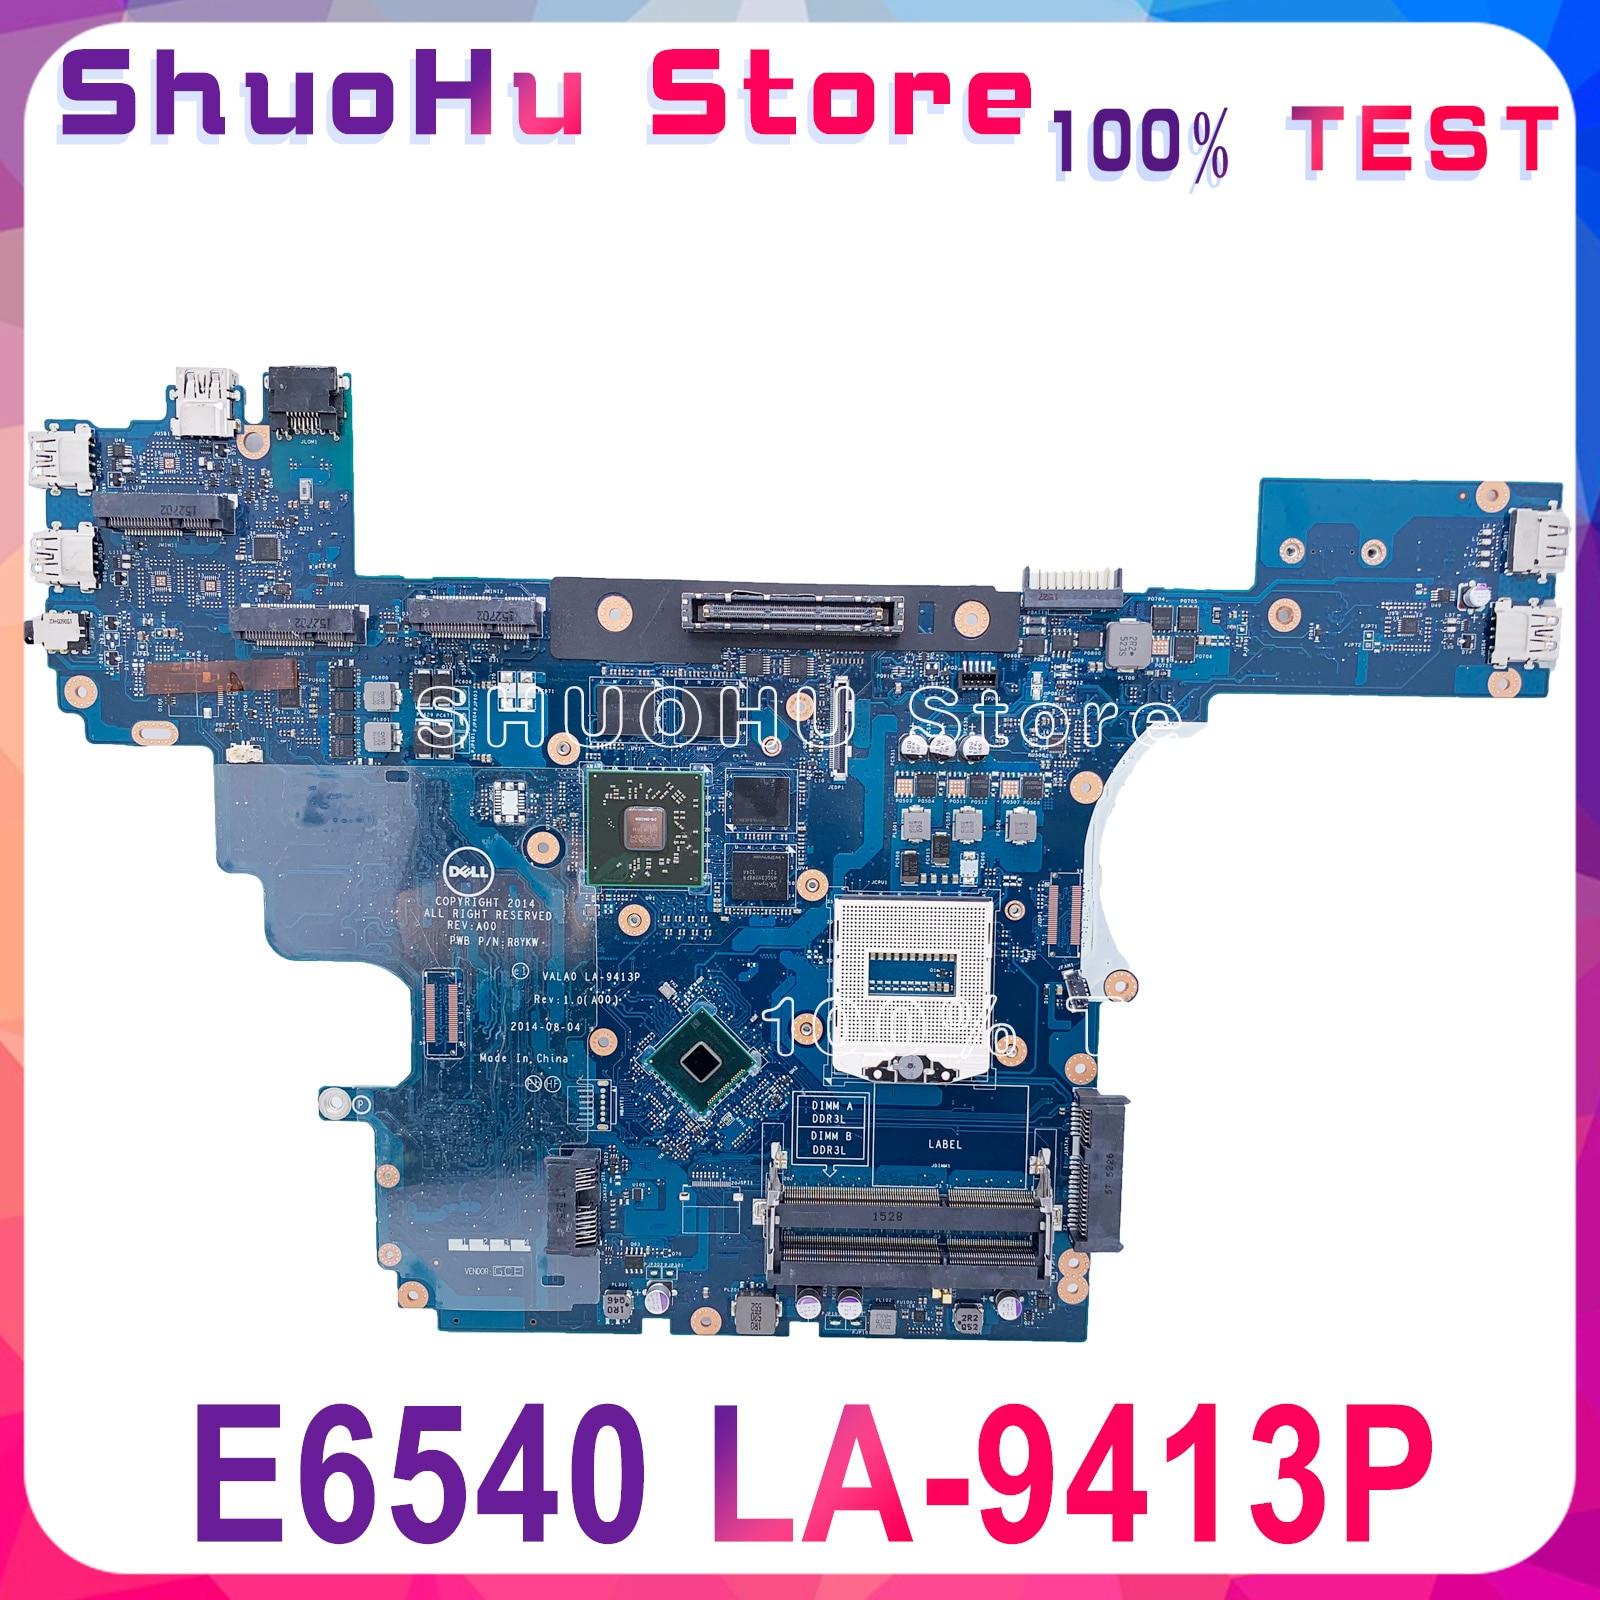 VALA0 LA-9413P для Dell Latitude E6540 Материнская плата ноутбука HM87 PGA947 DDR3L HD 8790 м 2 Гб